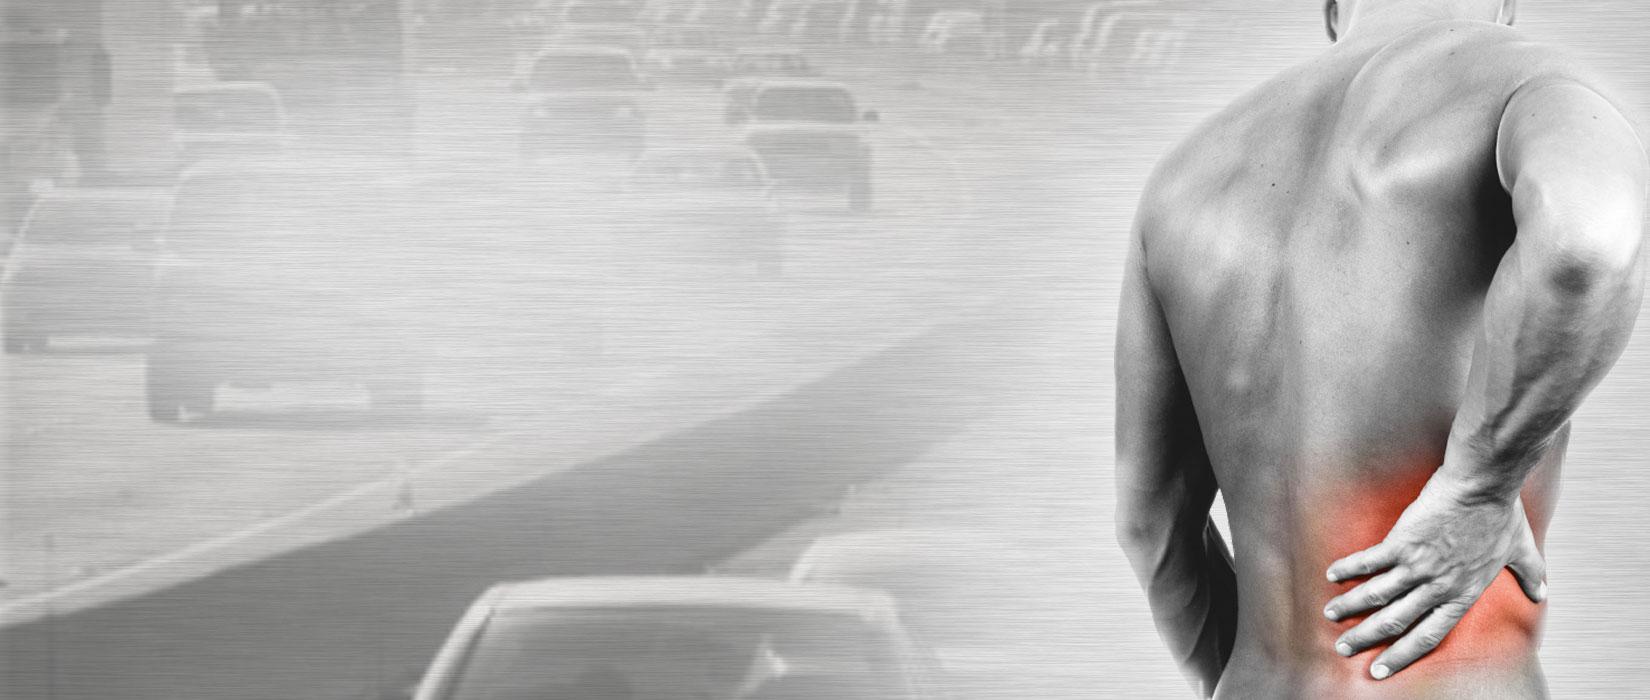 Auto Injury Chiropractors